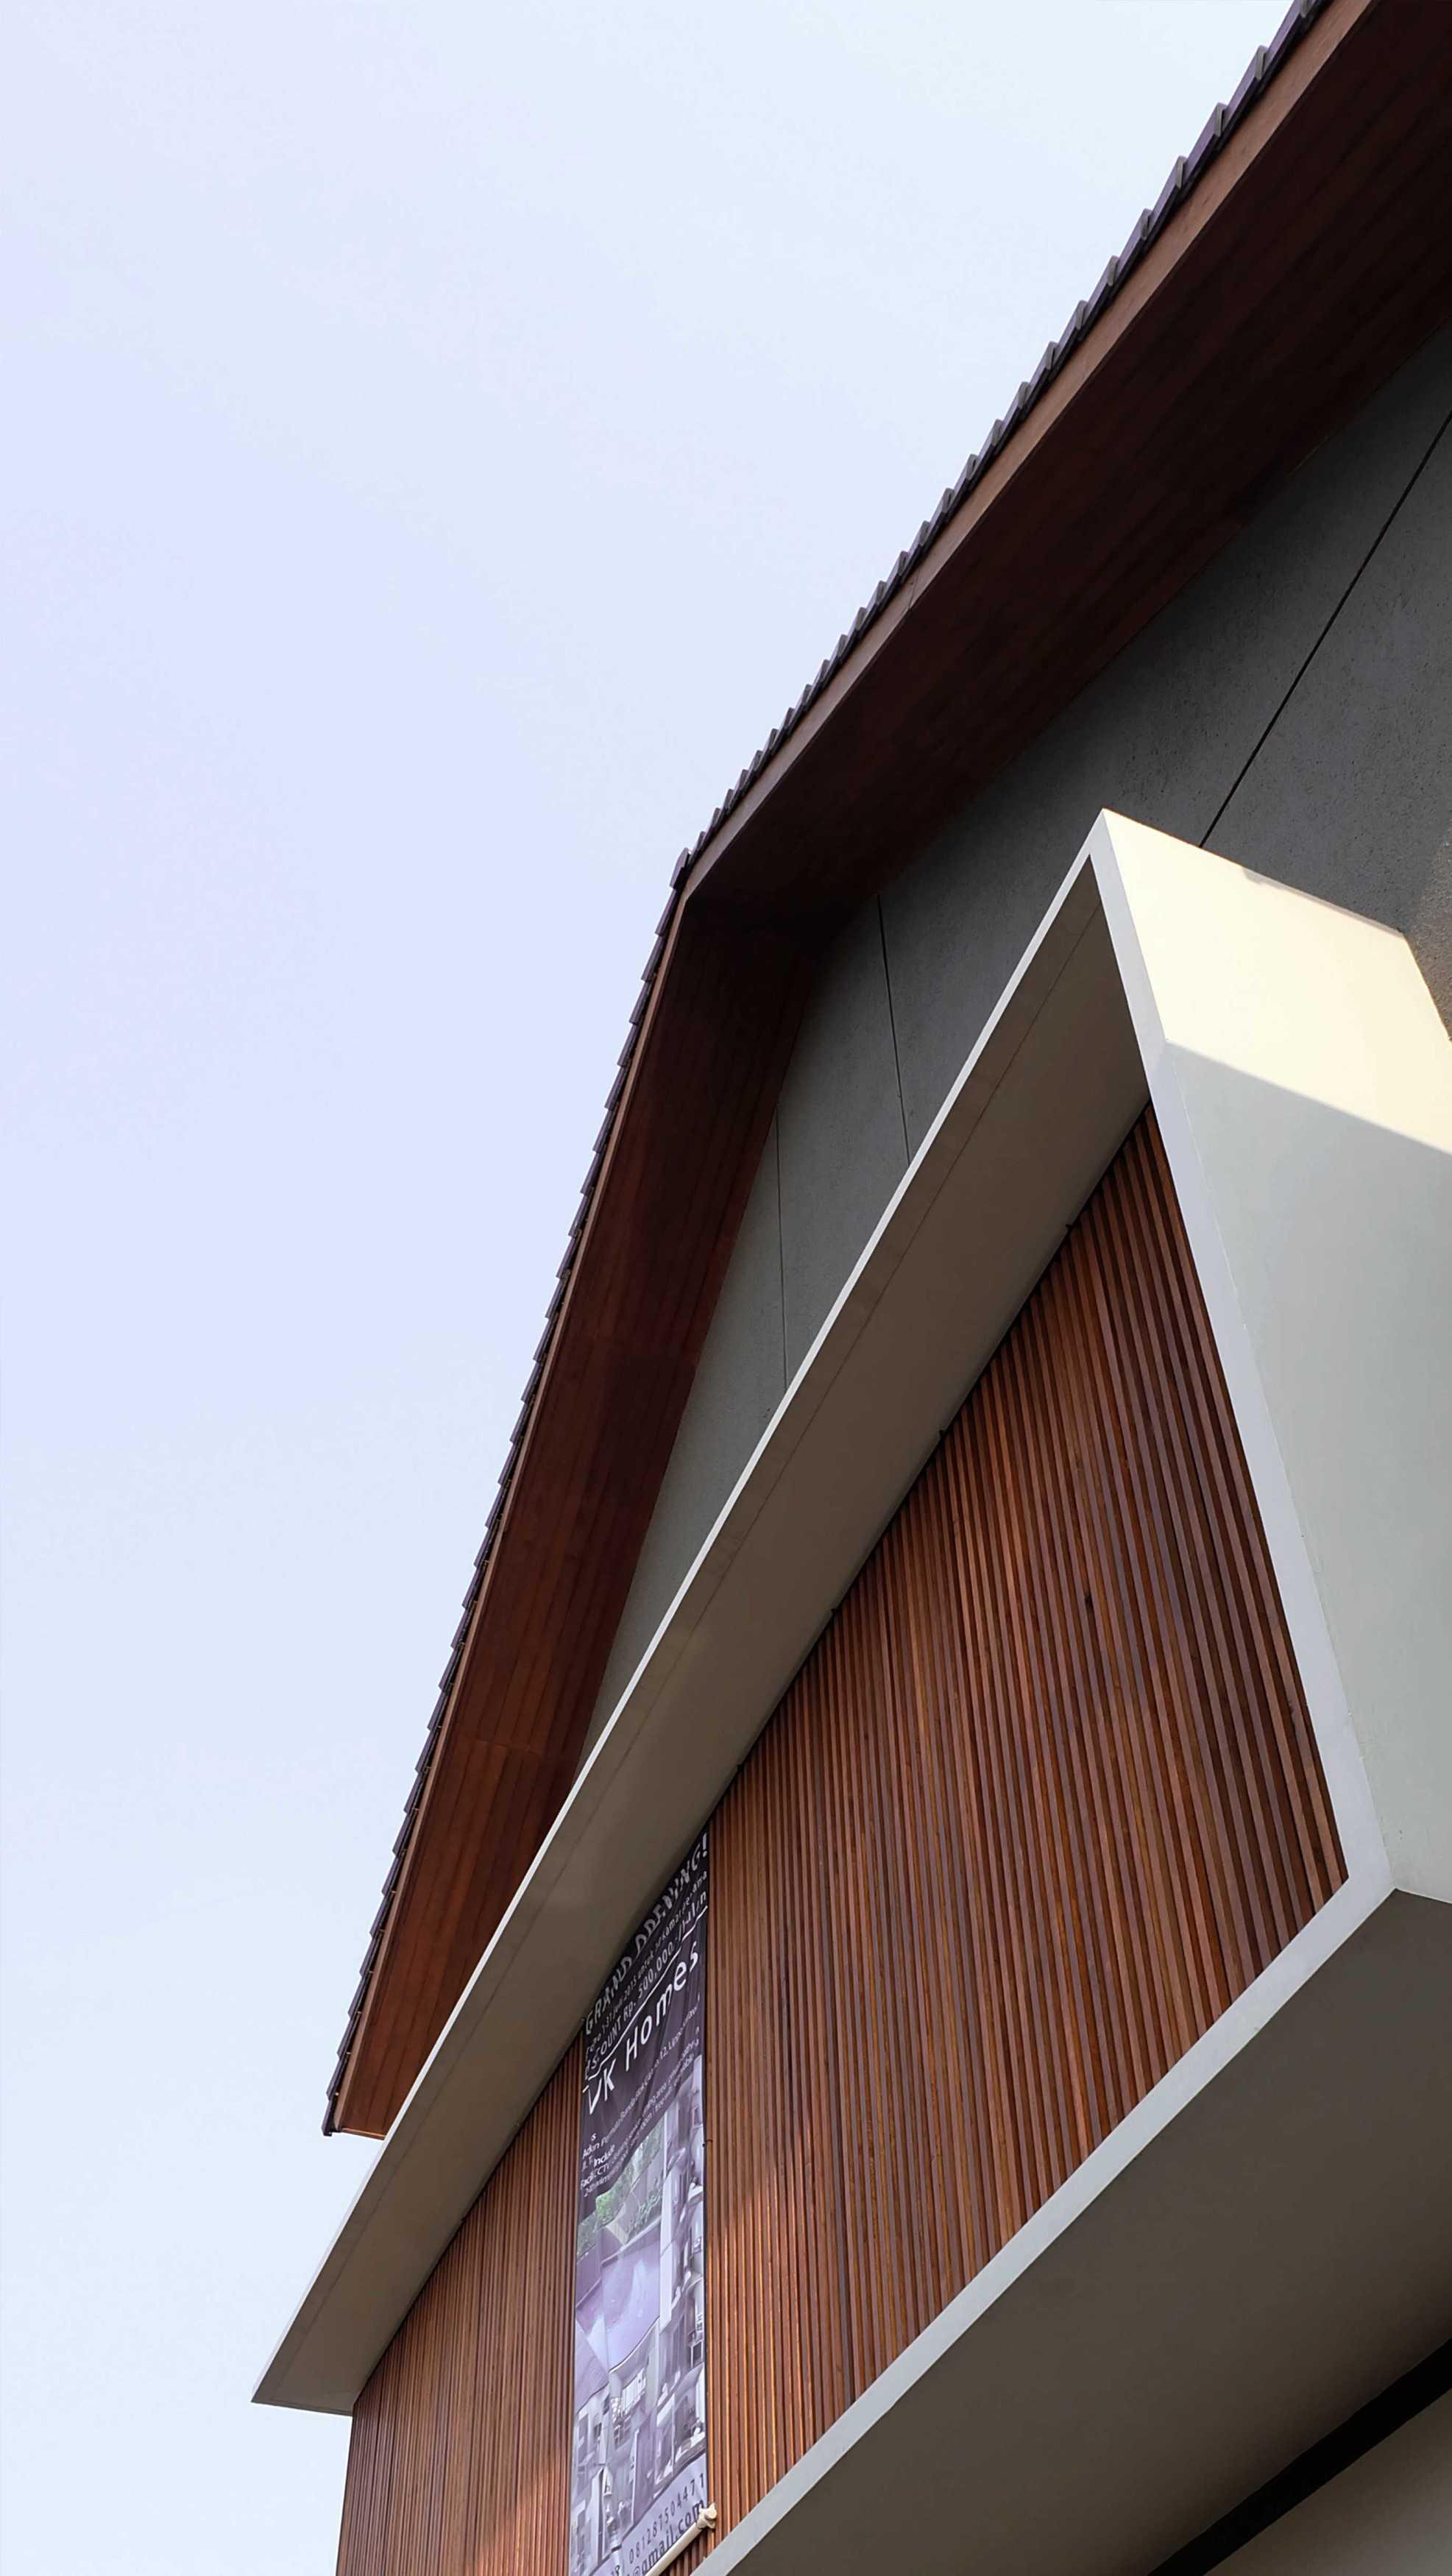 Gohte Architects Vk Homes Lippo Karawaci, Binong, Kec. Curug, Tangerang, Banten, Indonesia Lippo Karawaci, Binong, Kec. Curug, Tangerang, Banten, Indonesia Gohte-Architects-Vk-Homes   96619